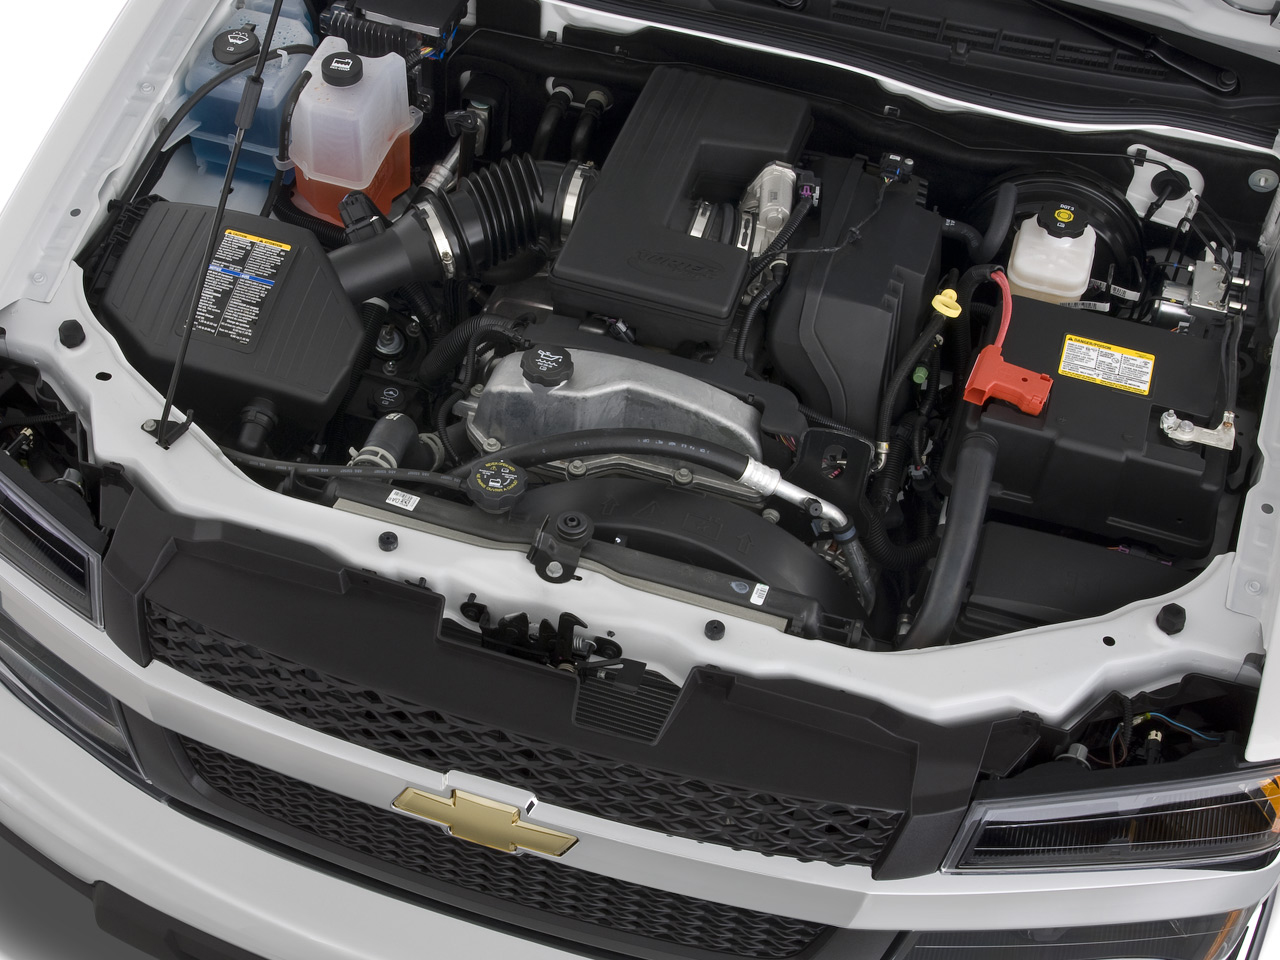 2009 Chevrolet Colorado 4WD Crew Cab 1LT - Chevy Fullsize ...